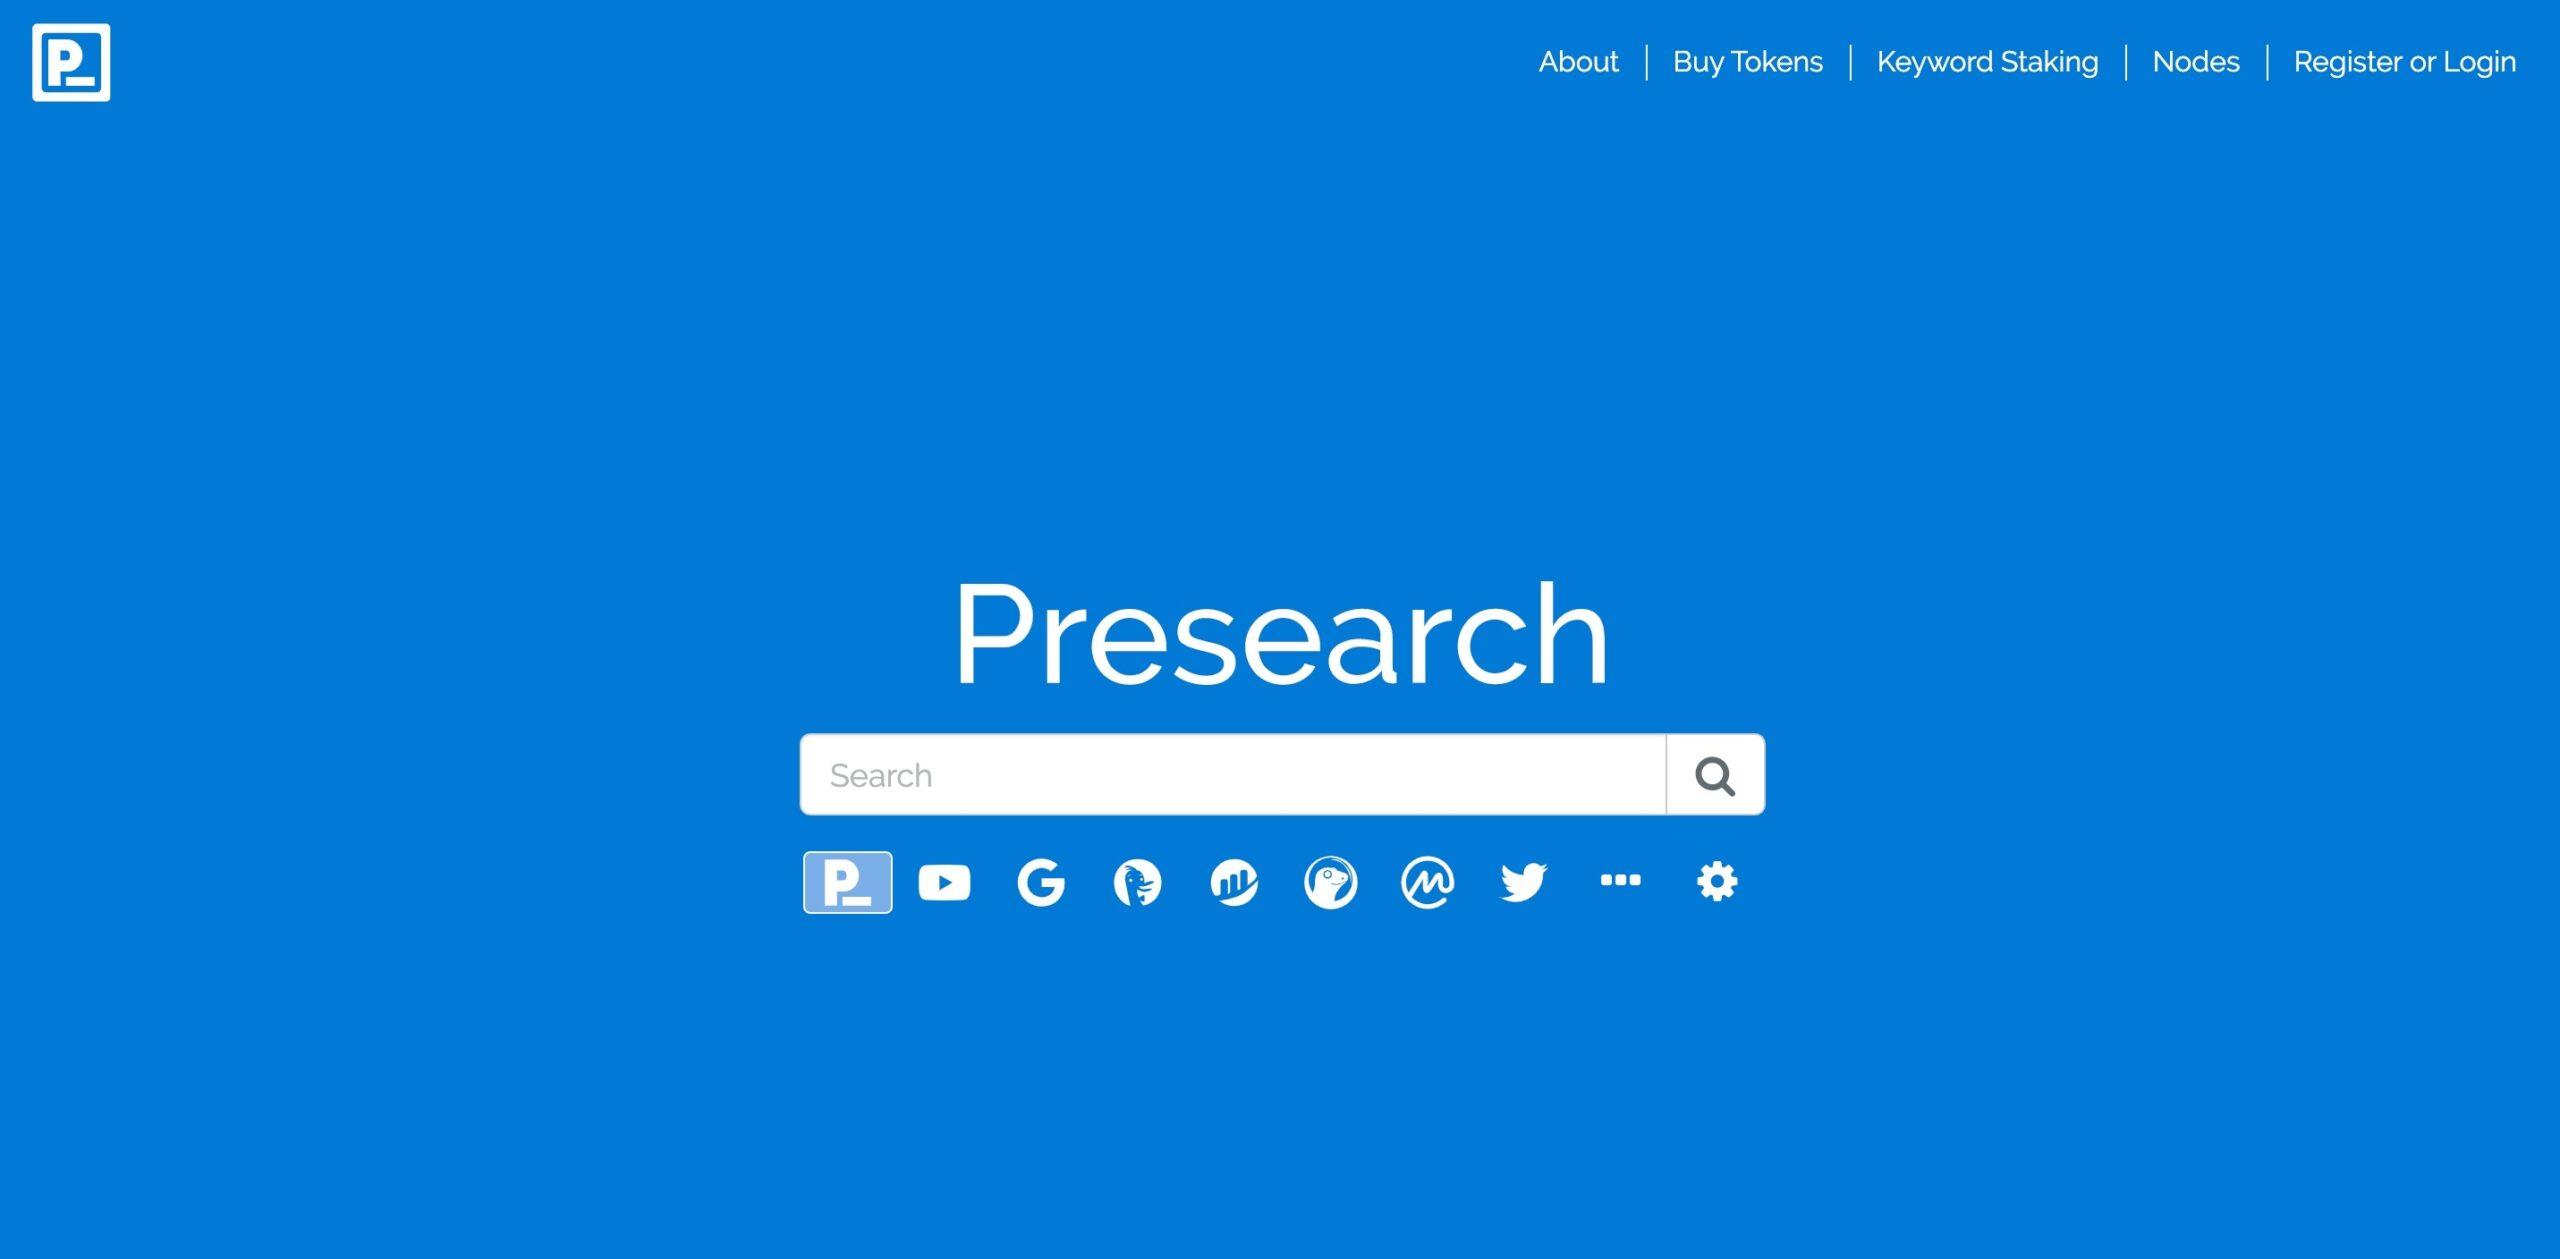 como funciona presearch